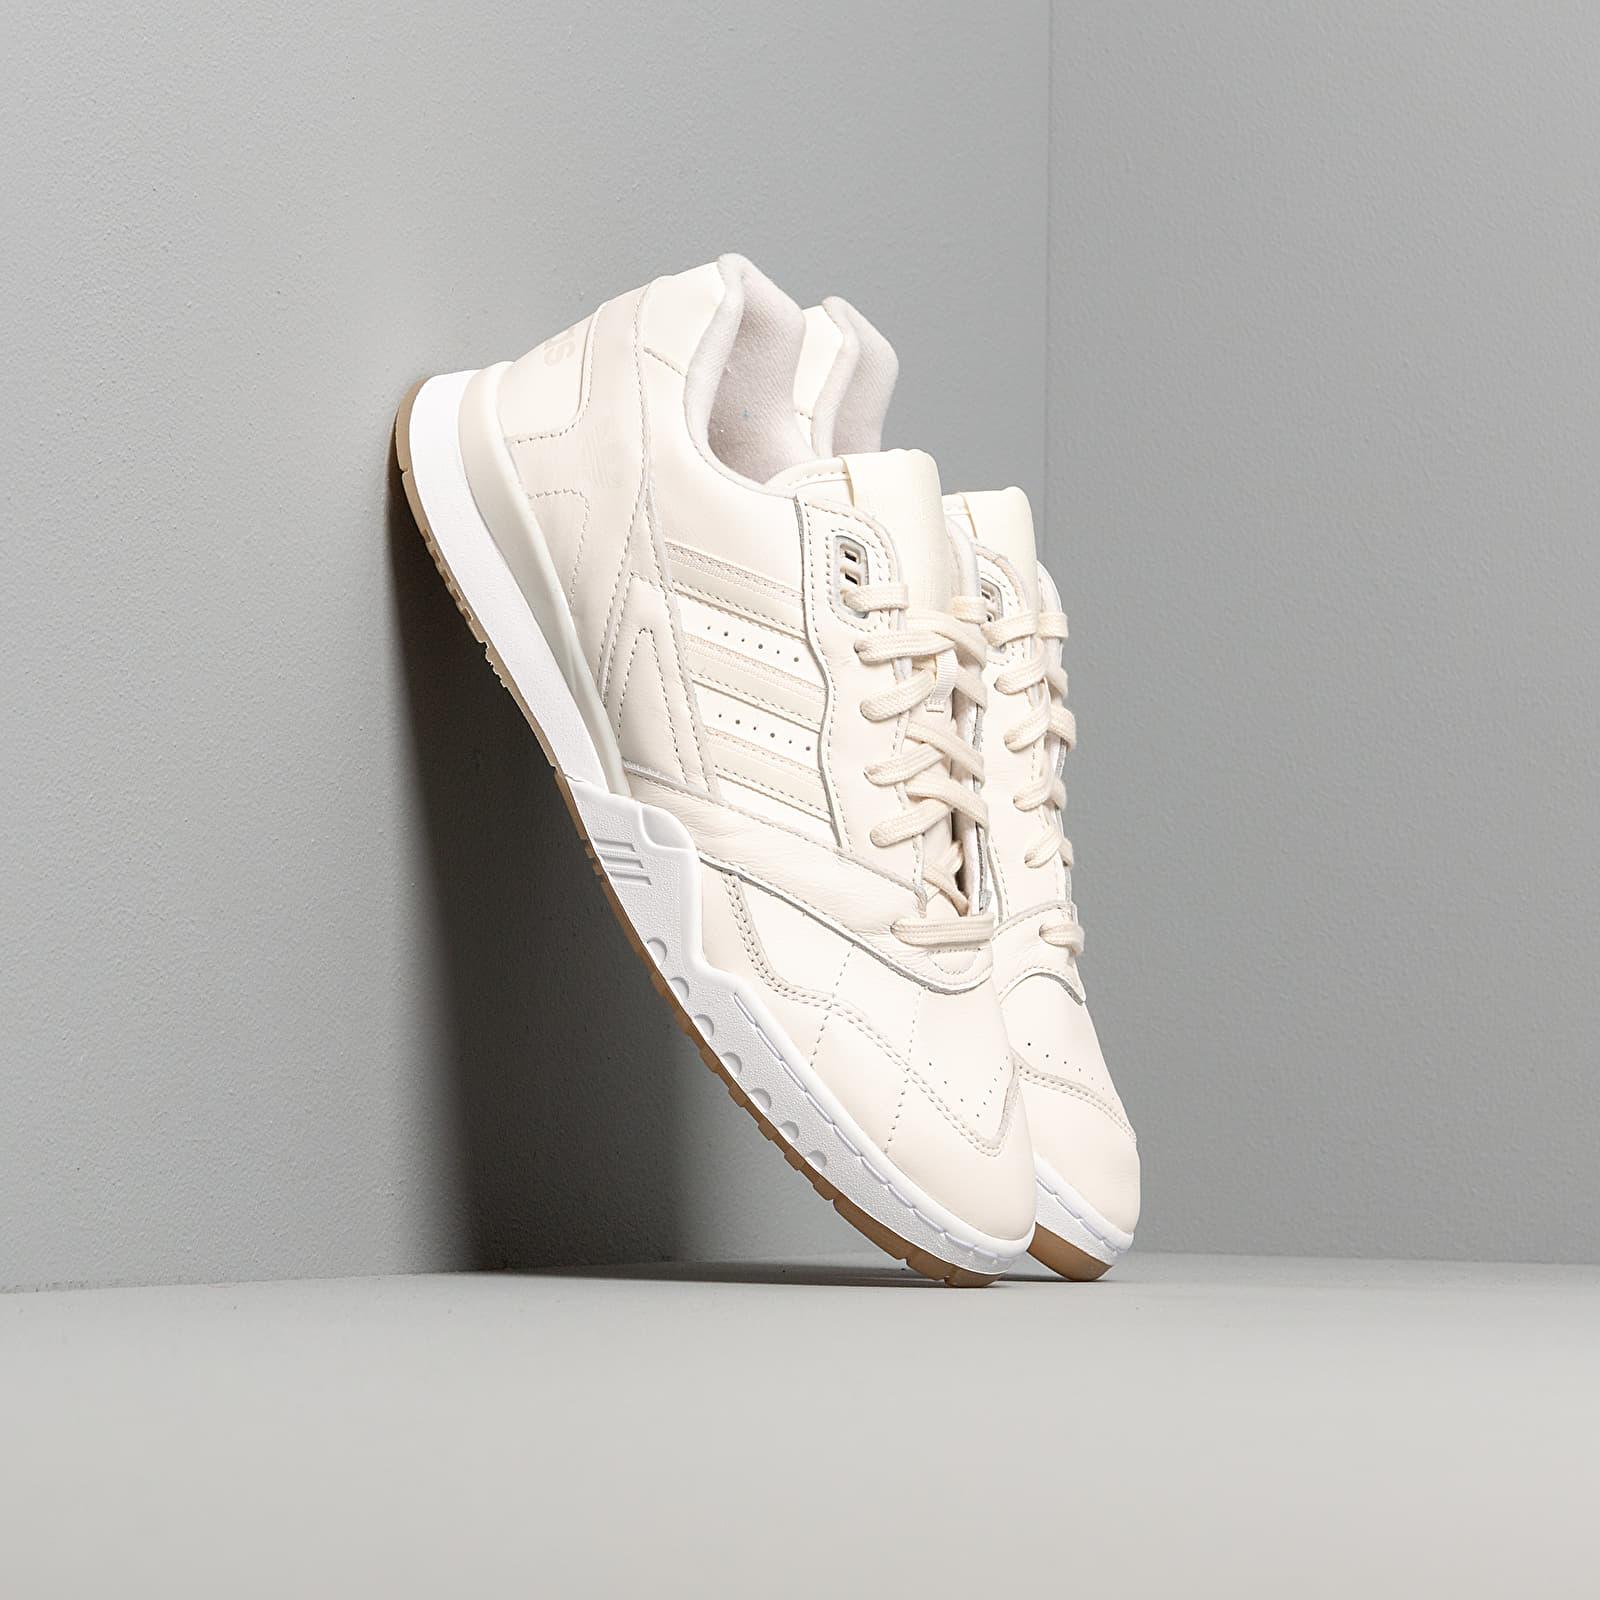 Pánské tenisky a boty adidas A.R. Trainer Core White/ Core White/ Ftw White